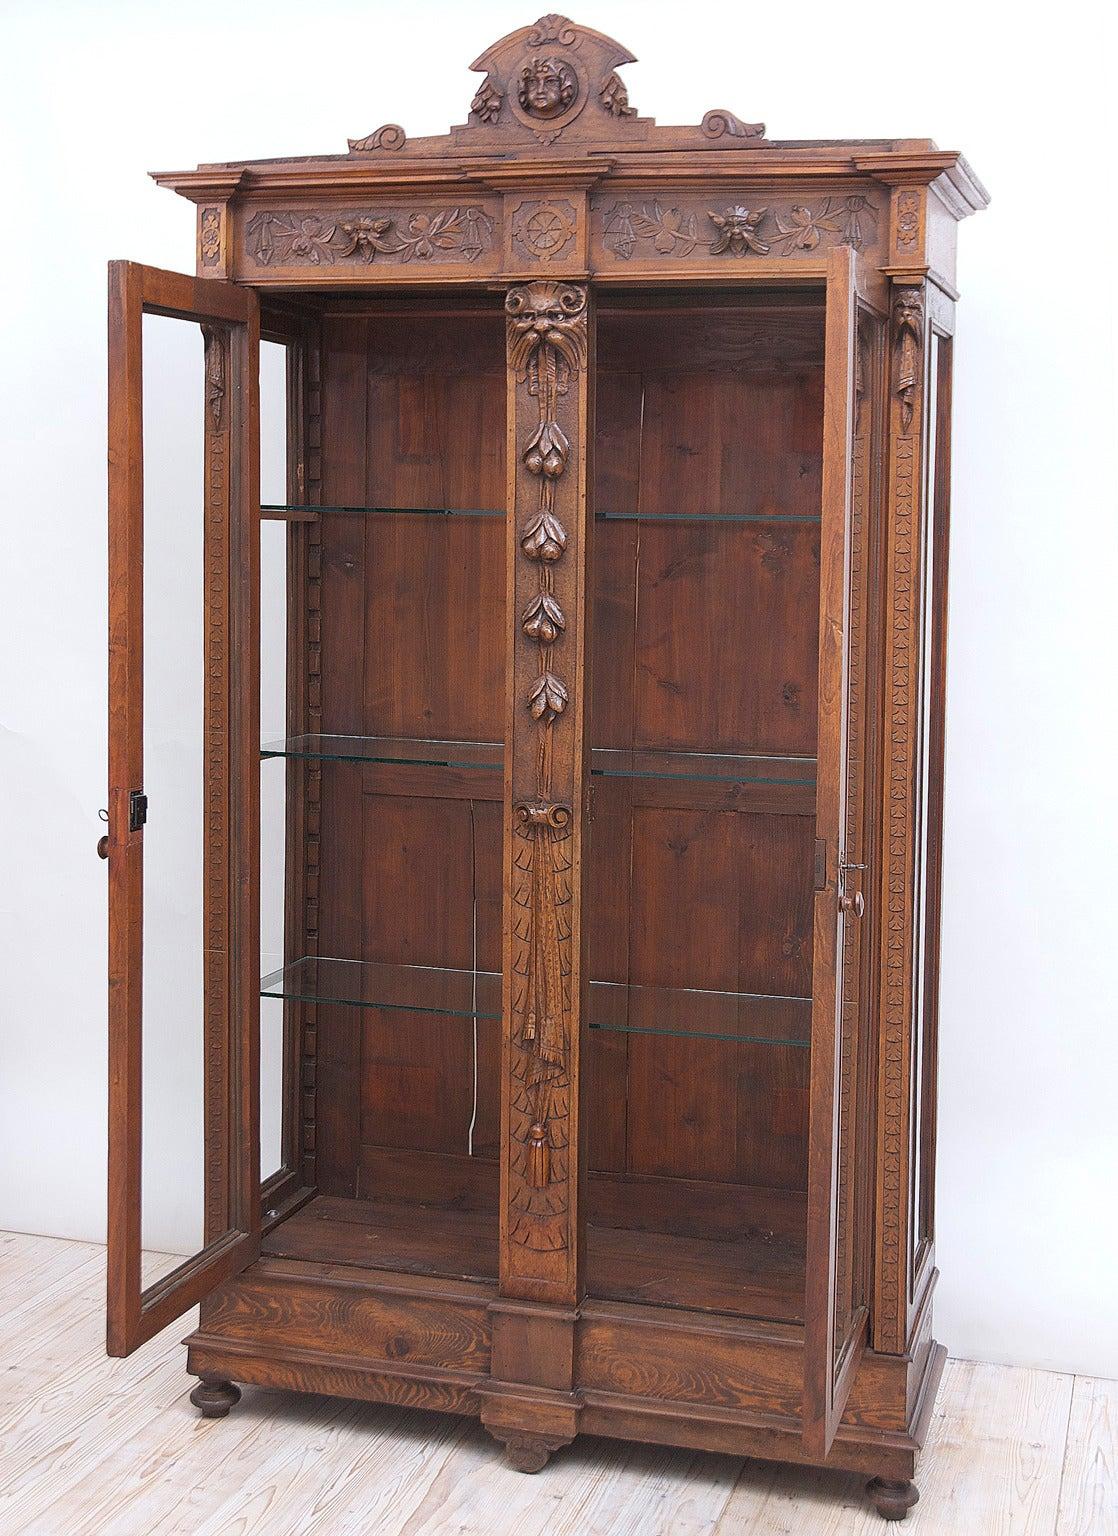 Flemish Renaissance Style Bookcase Vitrine in Walnut, Belgium, c. 1890 2